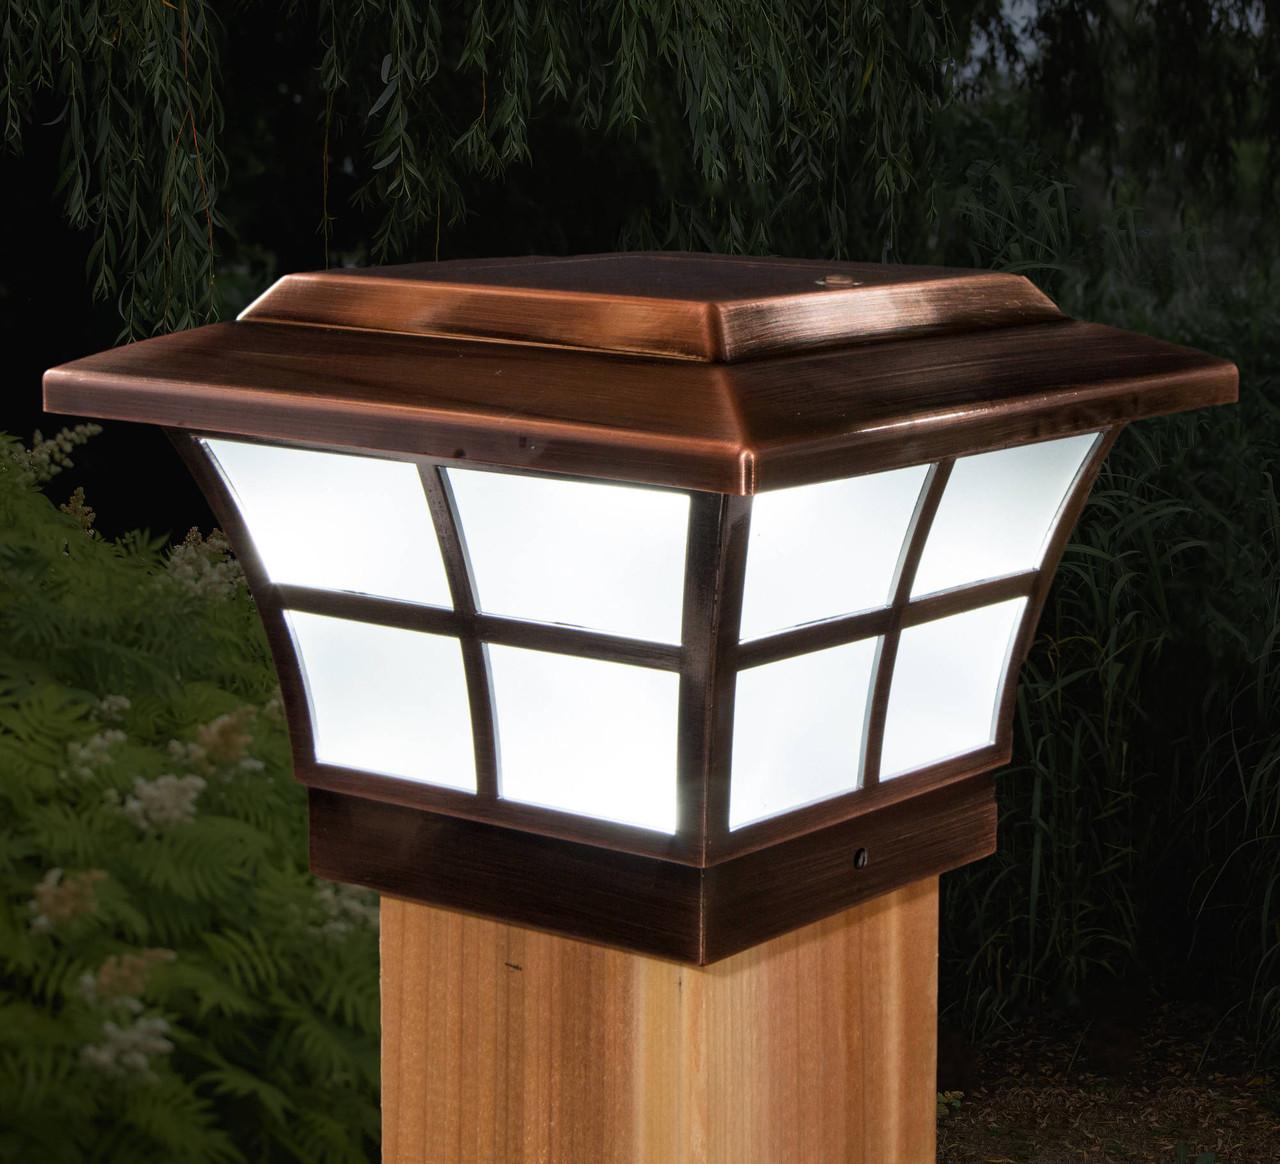 "4"" x 4"" Copper Plated Prestige Solar Post Cap Light from Classy Caps on Wood Post (SLO79C)"